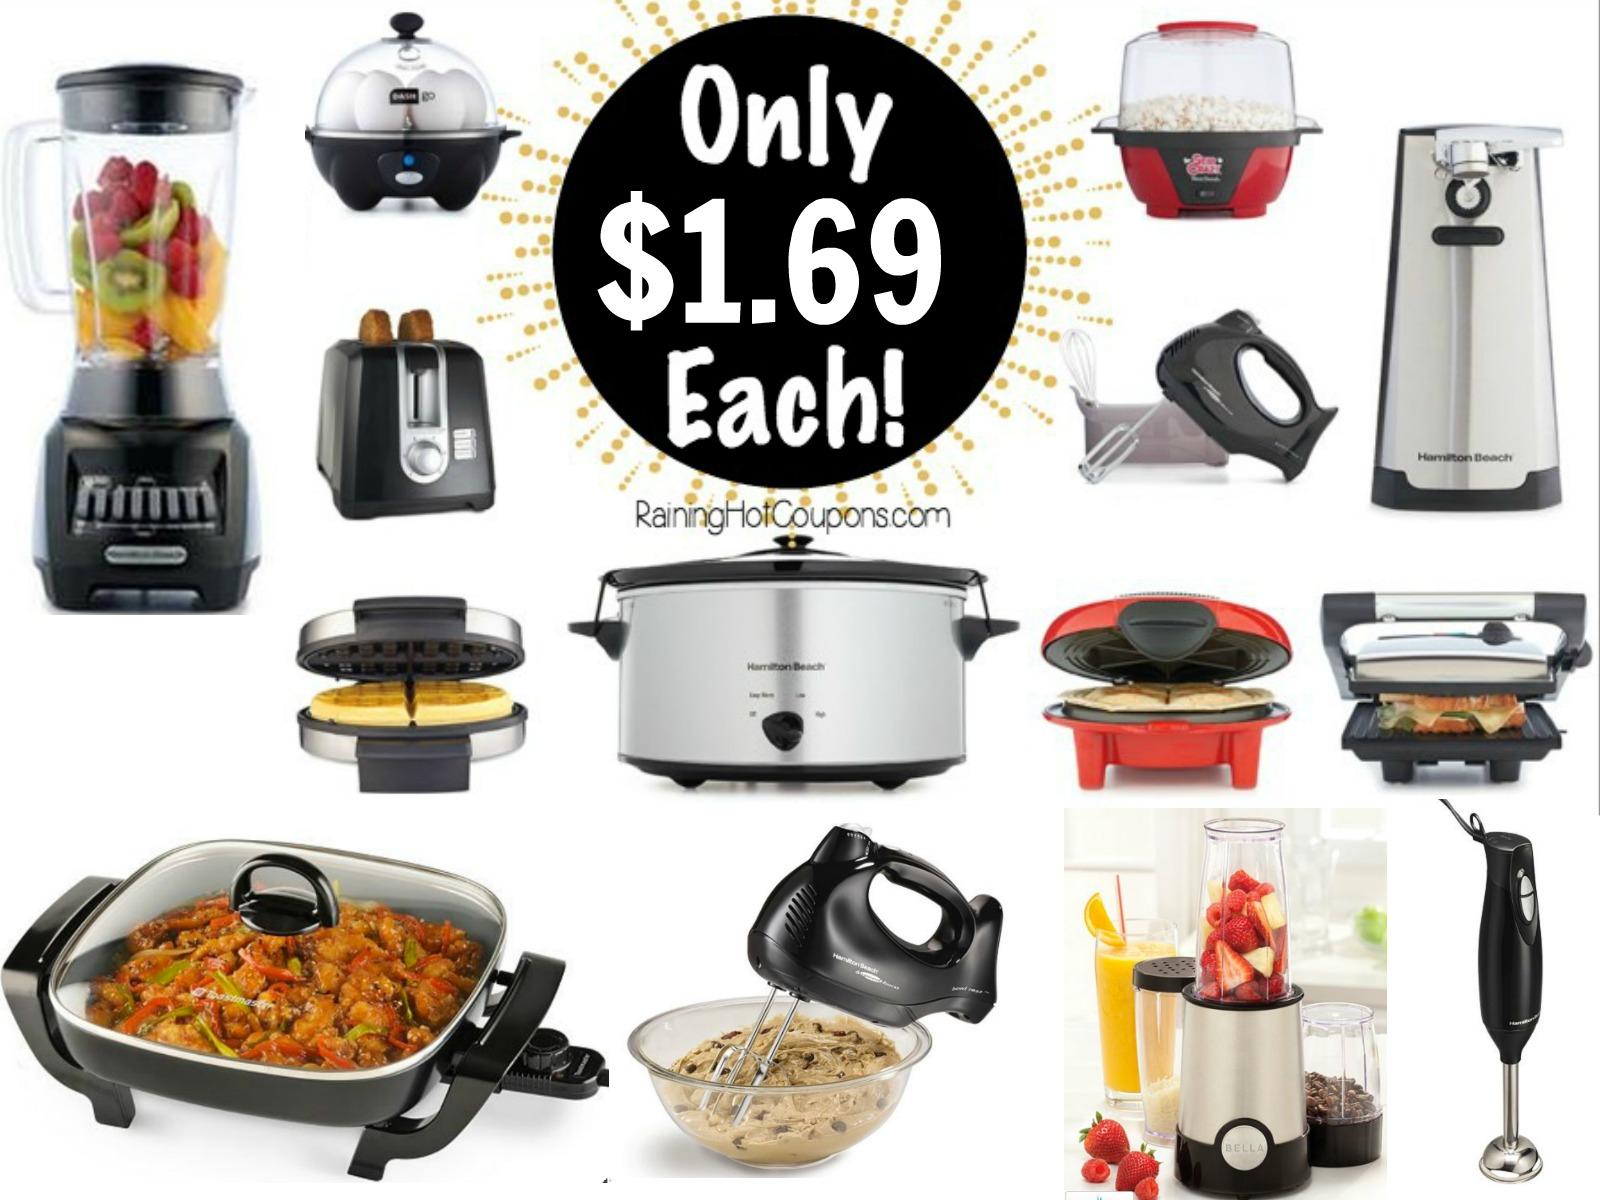 hot* kohl's: 6 kitchen appliances only $1.69 each ($239.99 value